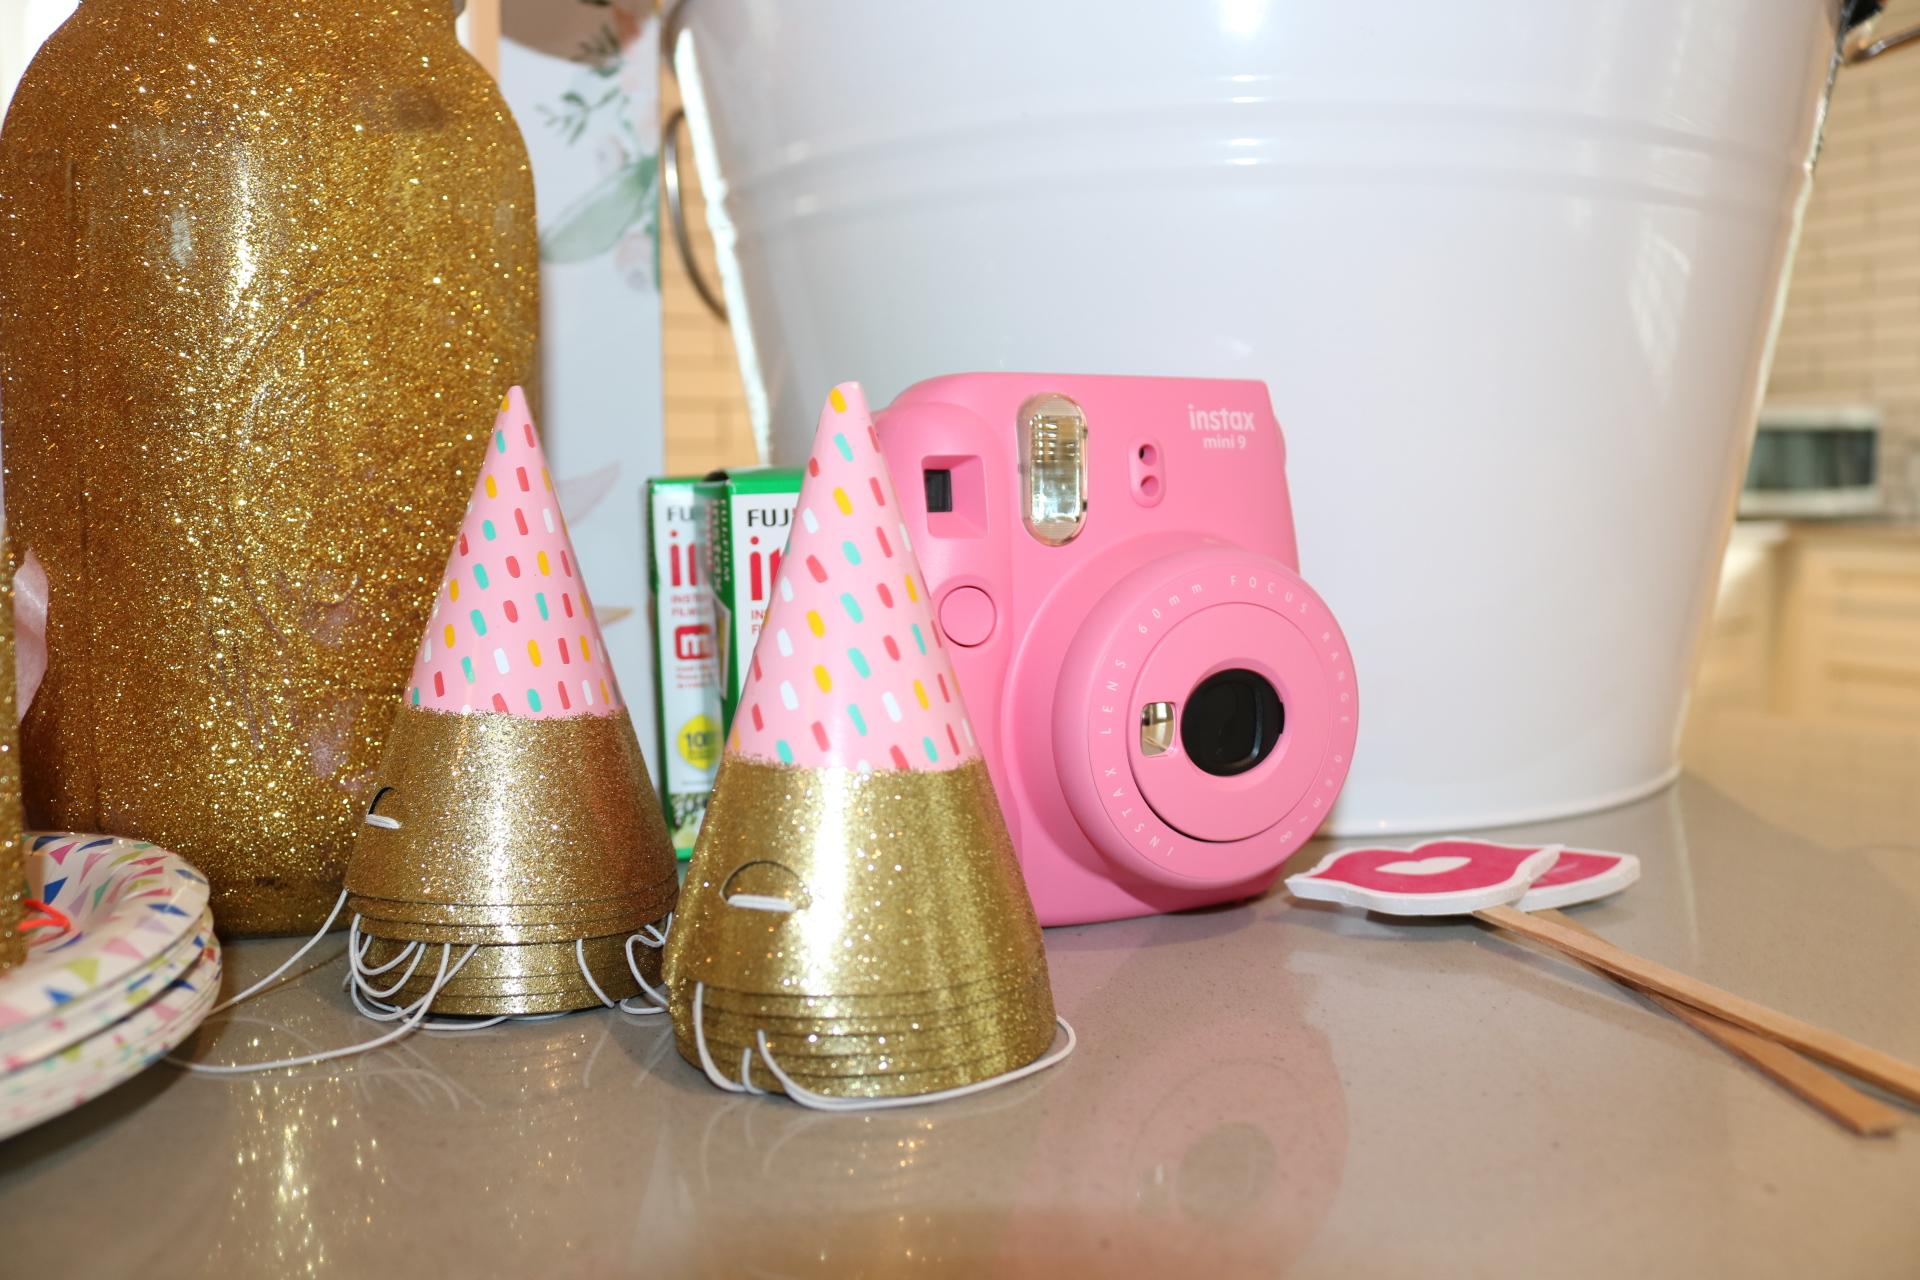 charleston bachelorette party ideas 4.JPG